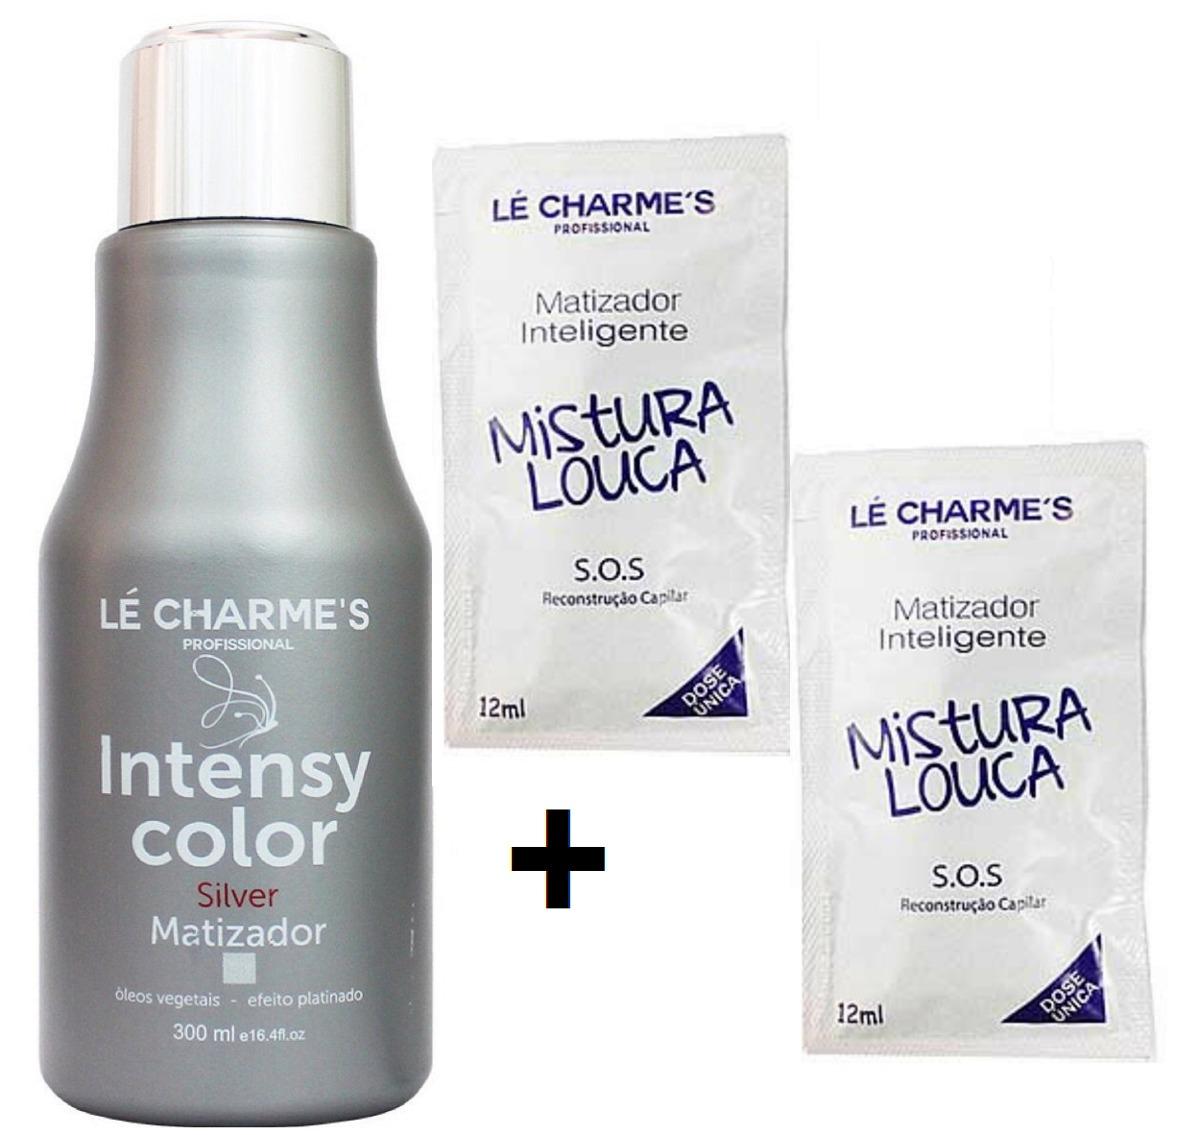 b4adcdcfd Intensy Prata 300ml + 2 Saches Mistura Louca Lé Charme's - R$ 65,99 ...